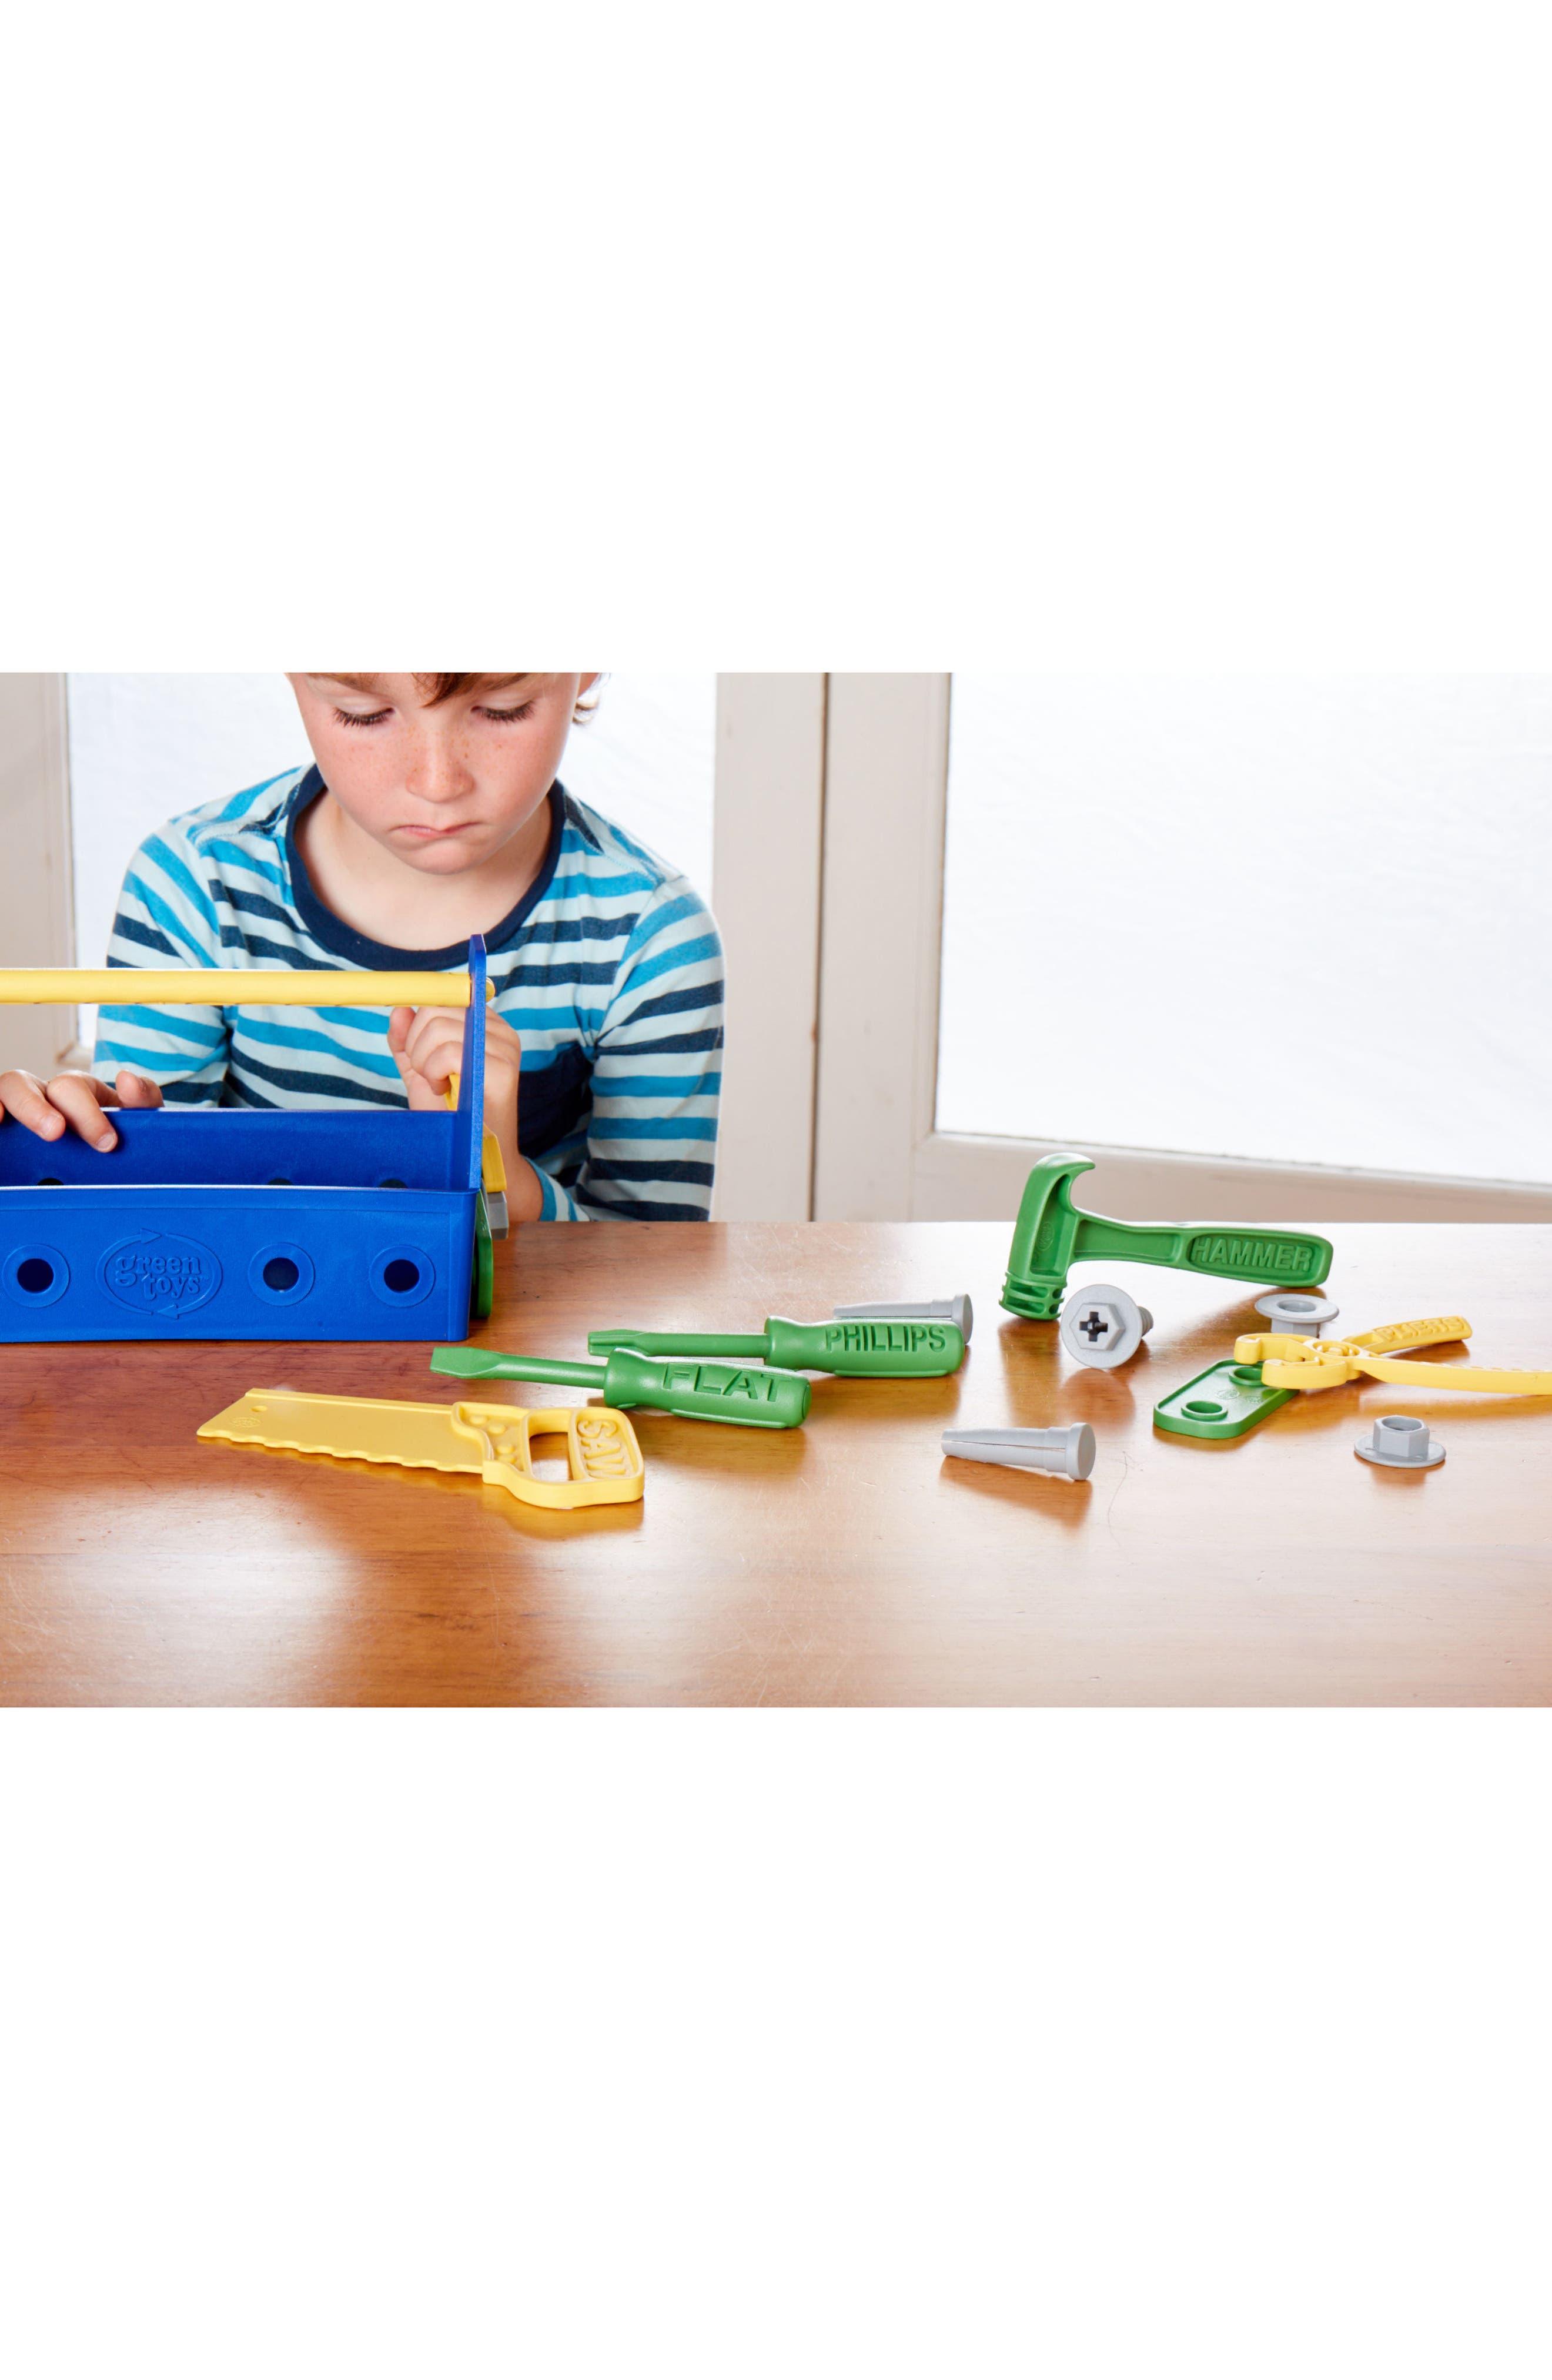 15-Piece Plastic Tool Set,                             Alternate thumbnail 9, color,